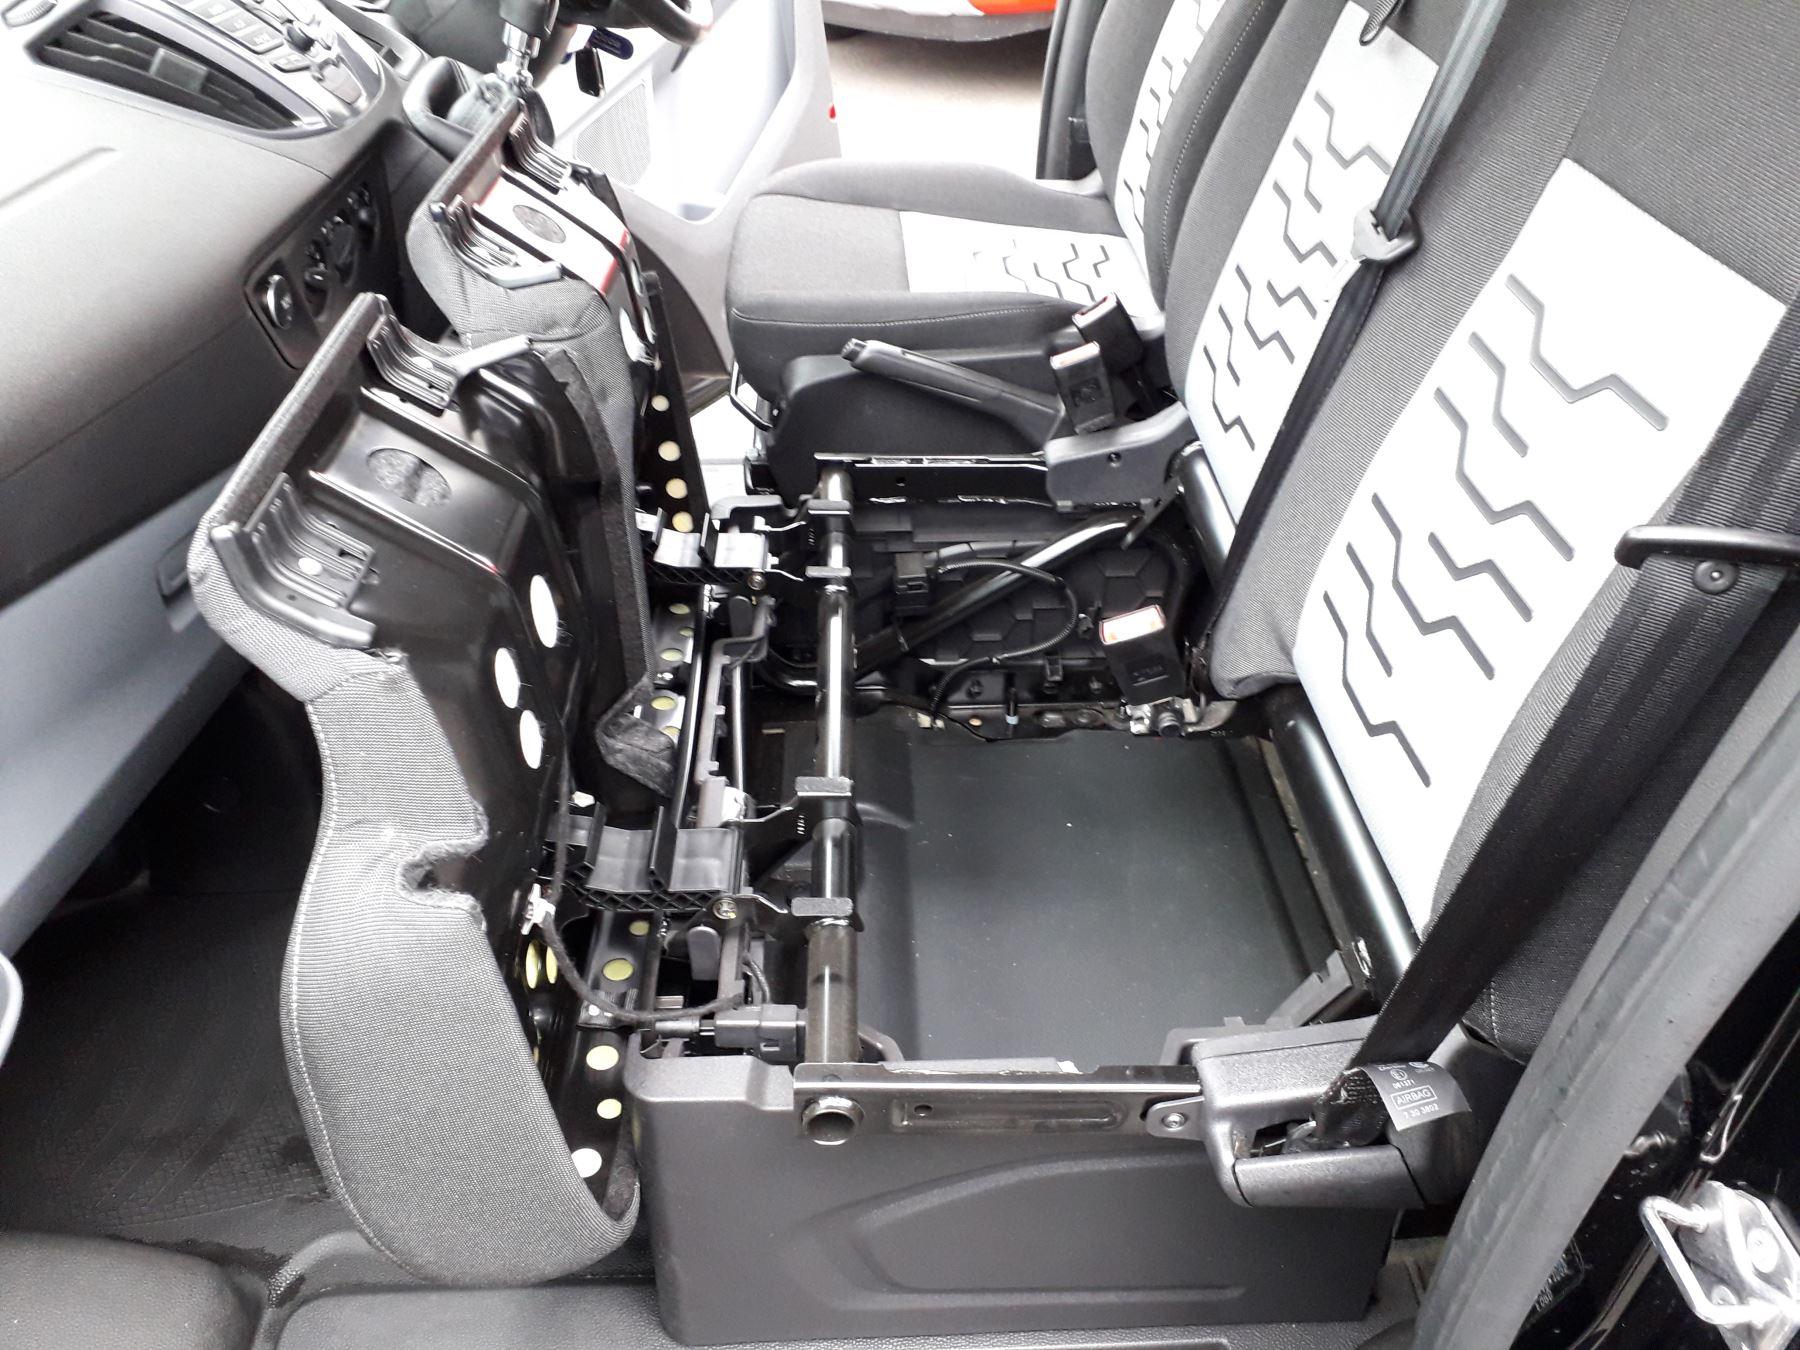 Ford Transit Custom 290 L2 Limited 2.0 TDCI 130PS Euro 6 image 19